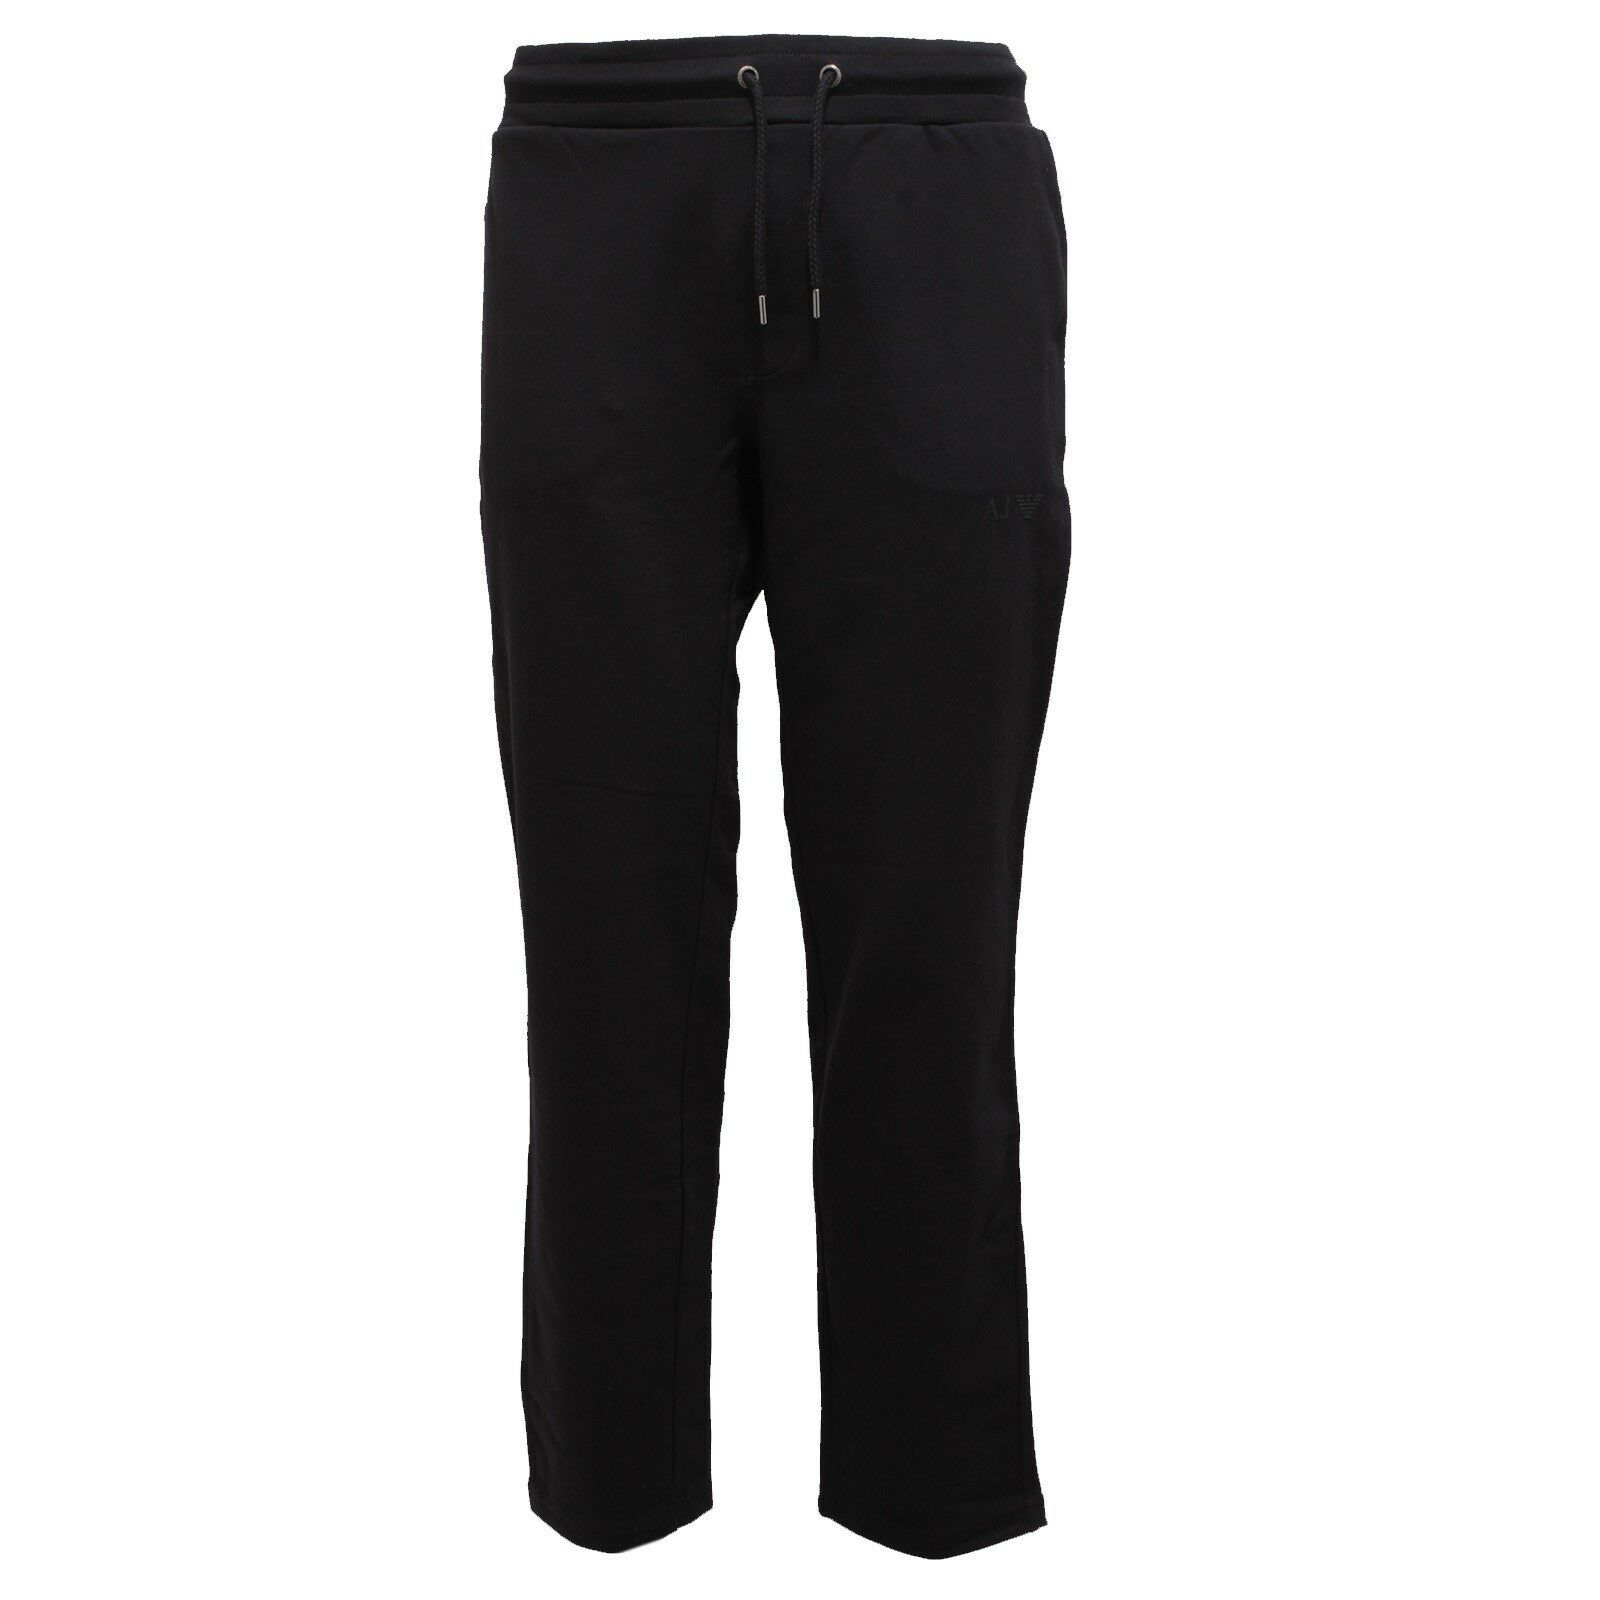 6246Y pantalone tuta uomo nero ARMANI JEANS pant trouser man